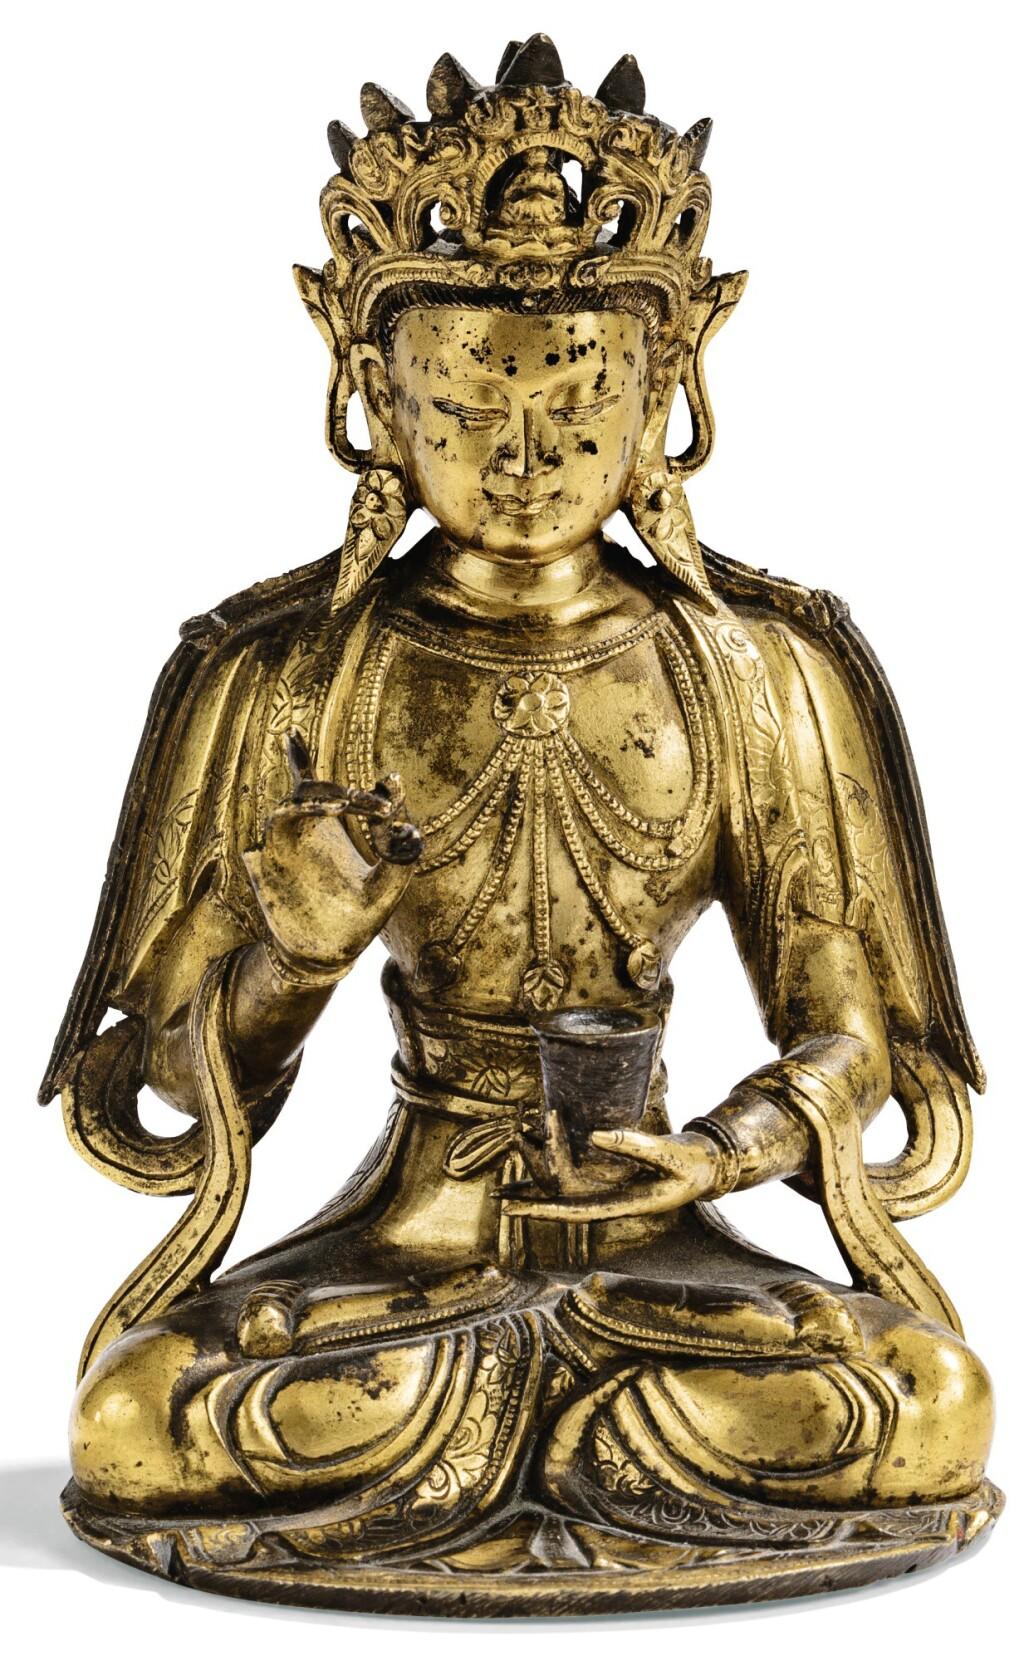 PETITE STATUETTE DE GUANYIN EN BRONZE DORÉ DYNASTIE MING | 明 鎏金銅觀音坐像 | A small gilt-bronze figure of Guanyin, Ming Dynasty